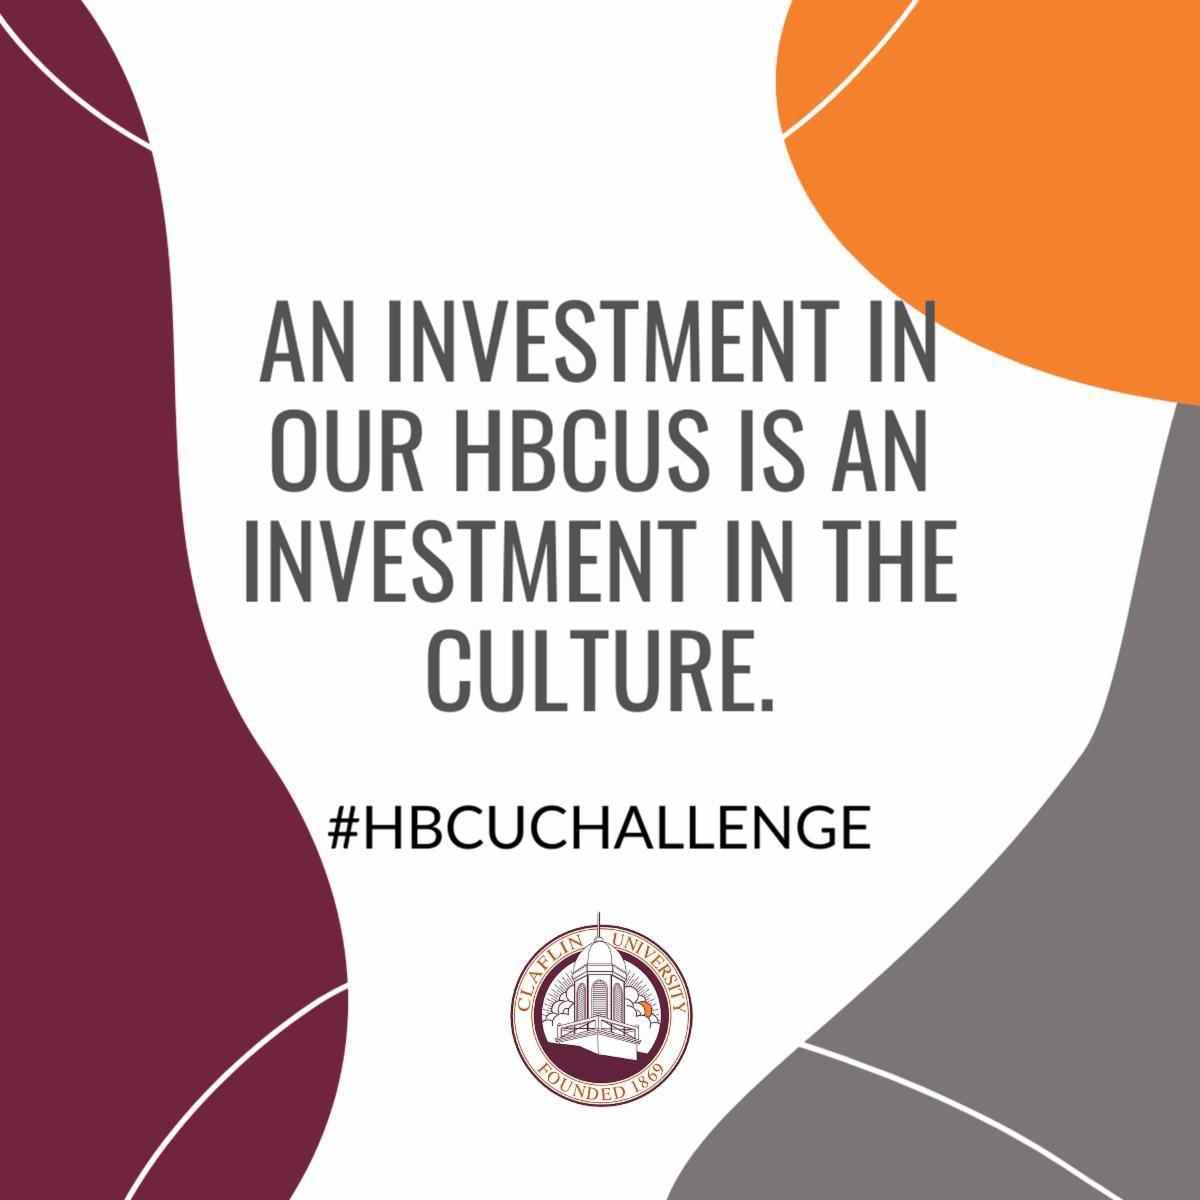 HBCU Challenge